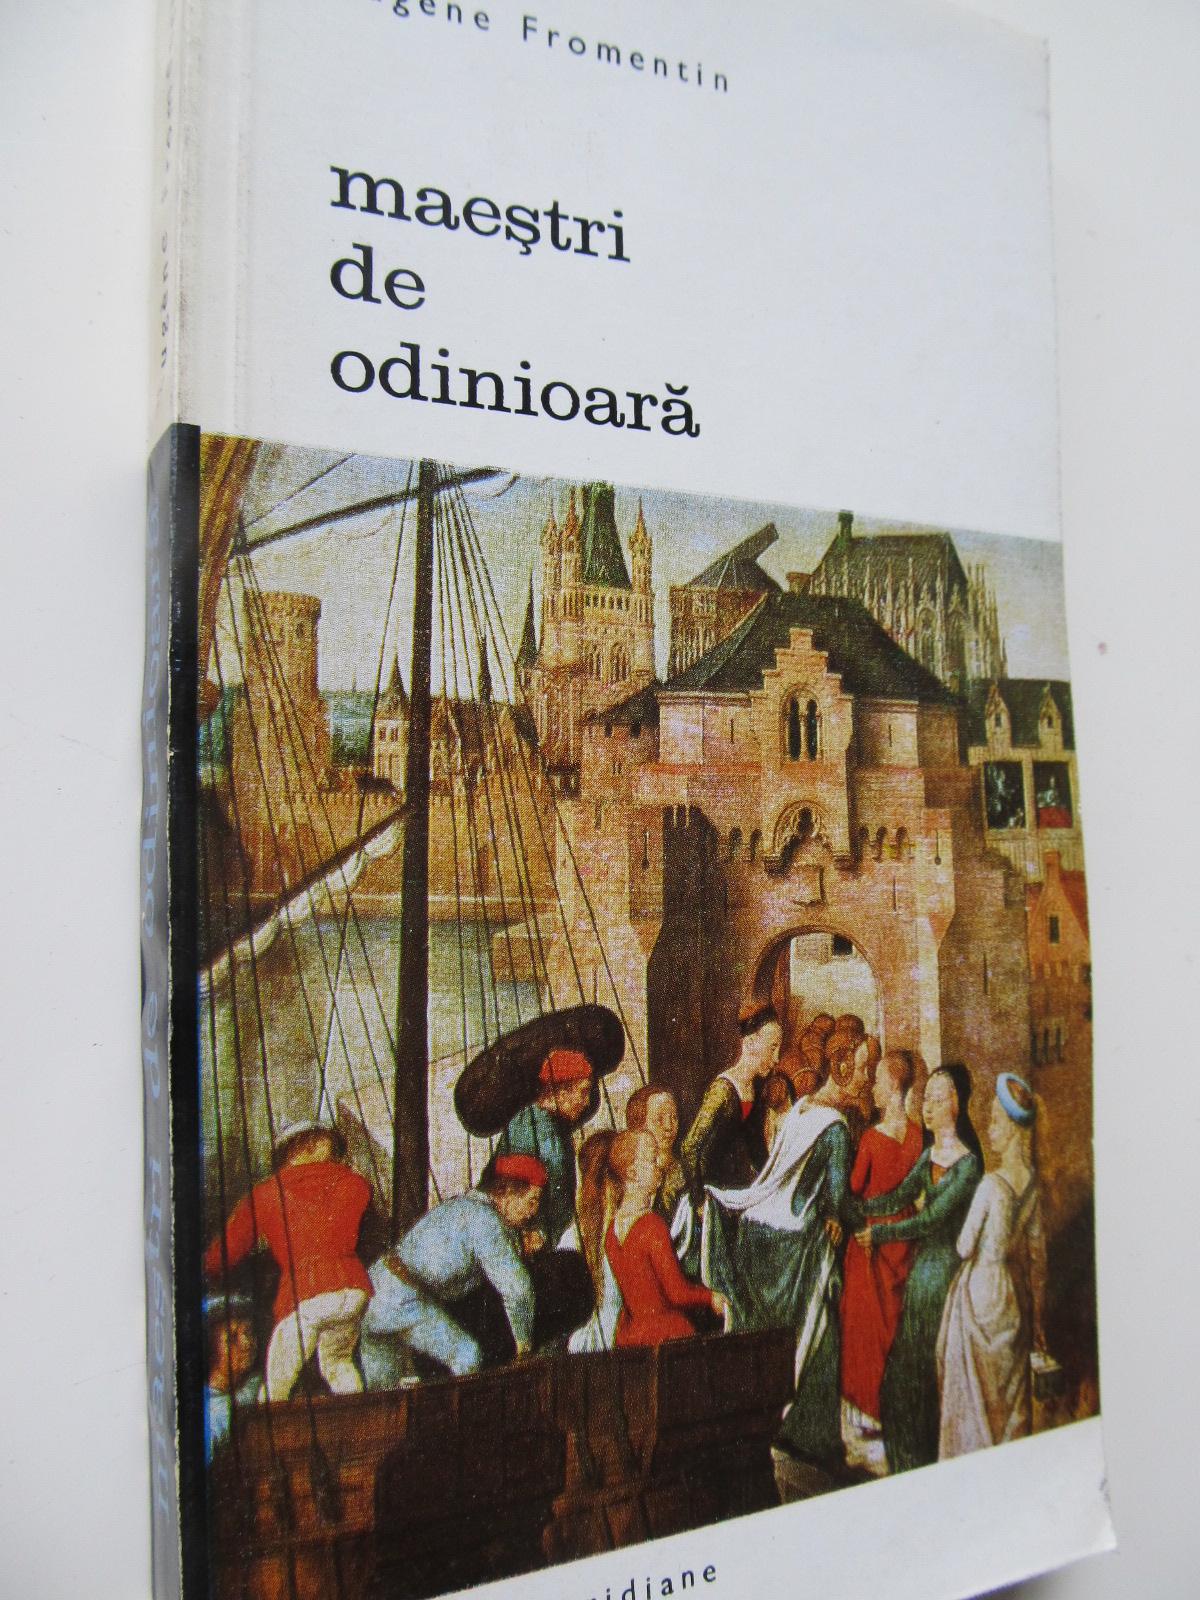 Maestrii de odinioara - Eugene Fromentin | Detalii carte